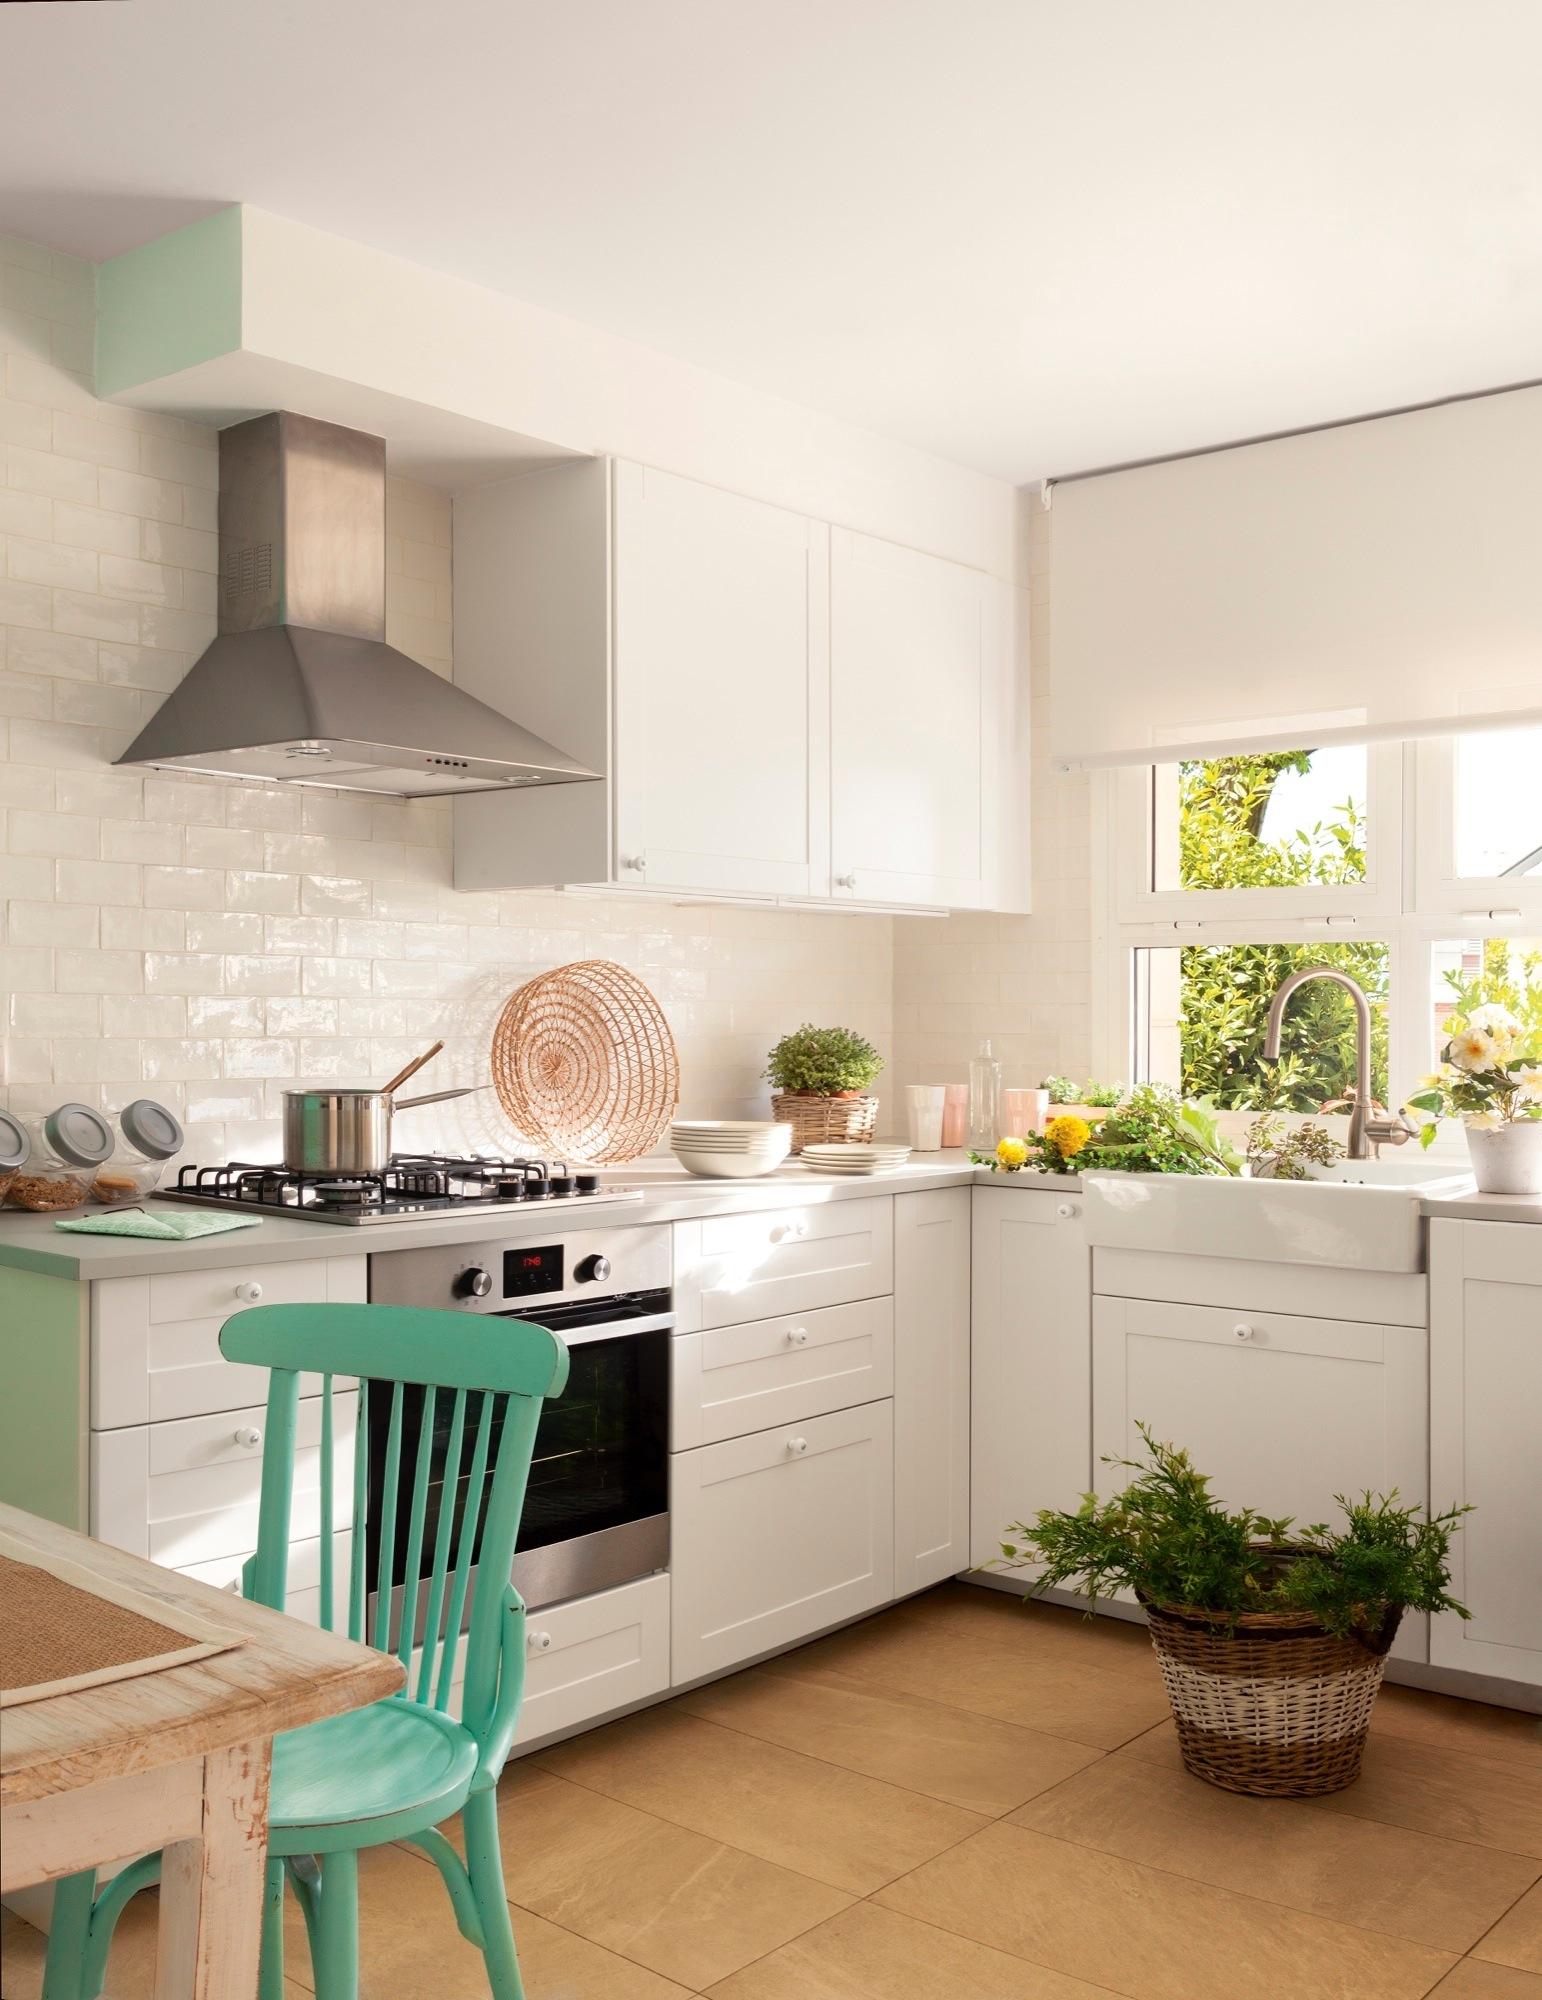 20 fotos de cocinas peque as bien aprovechadas for Mobiliario cocina